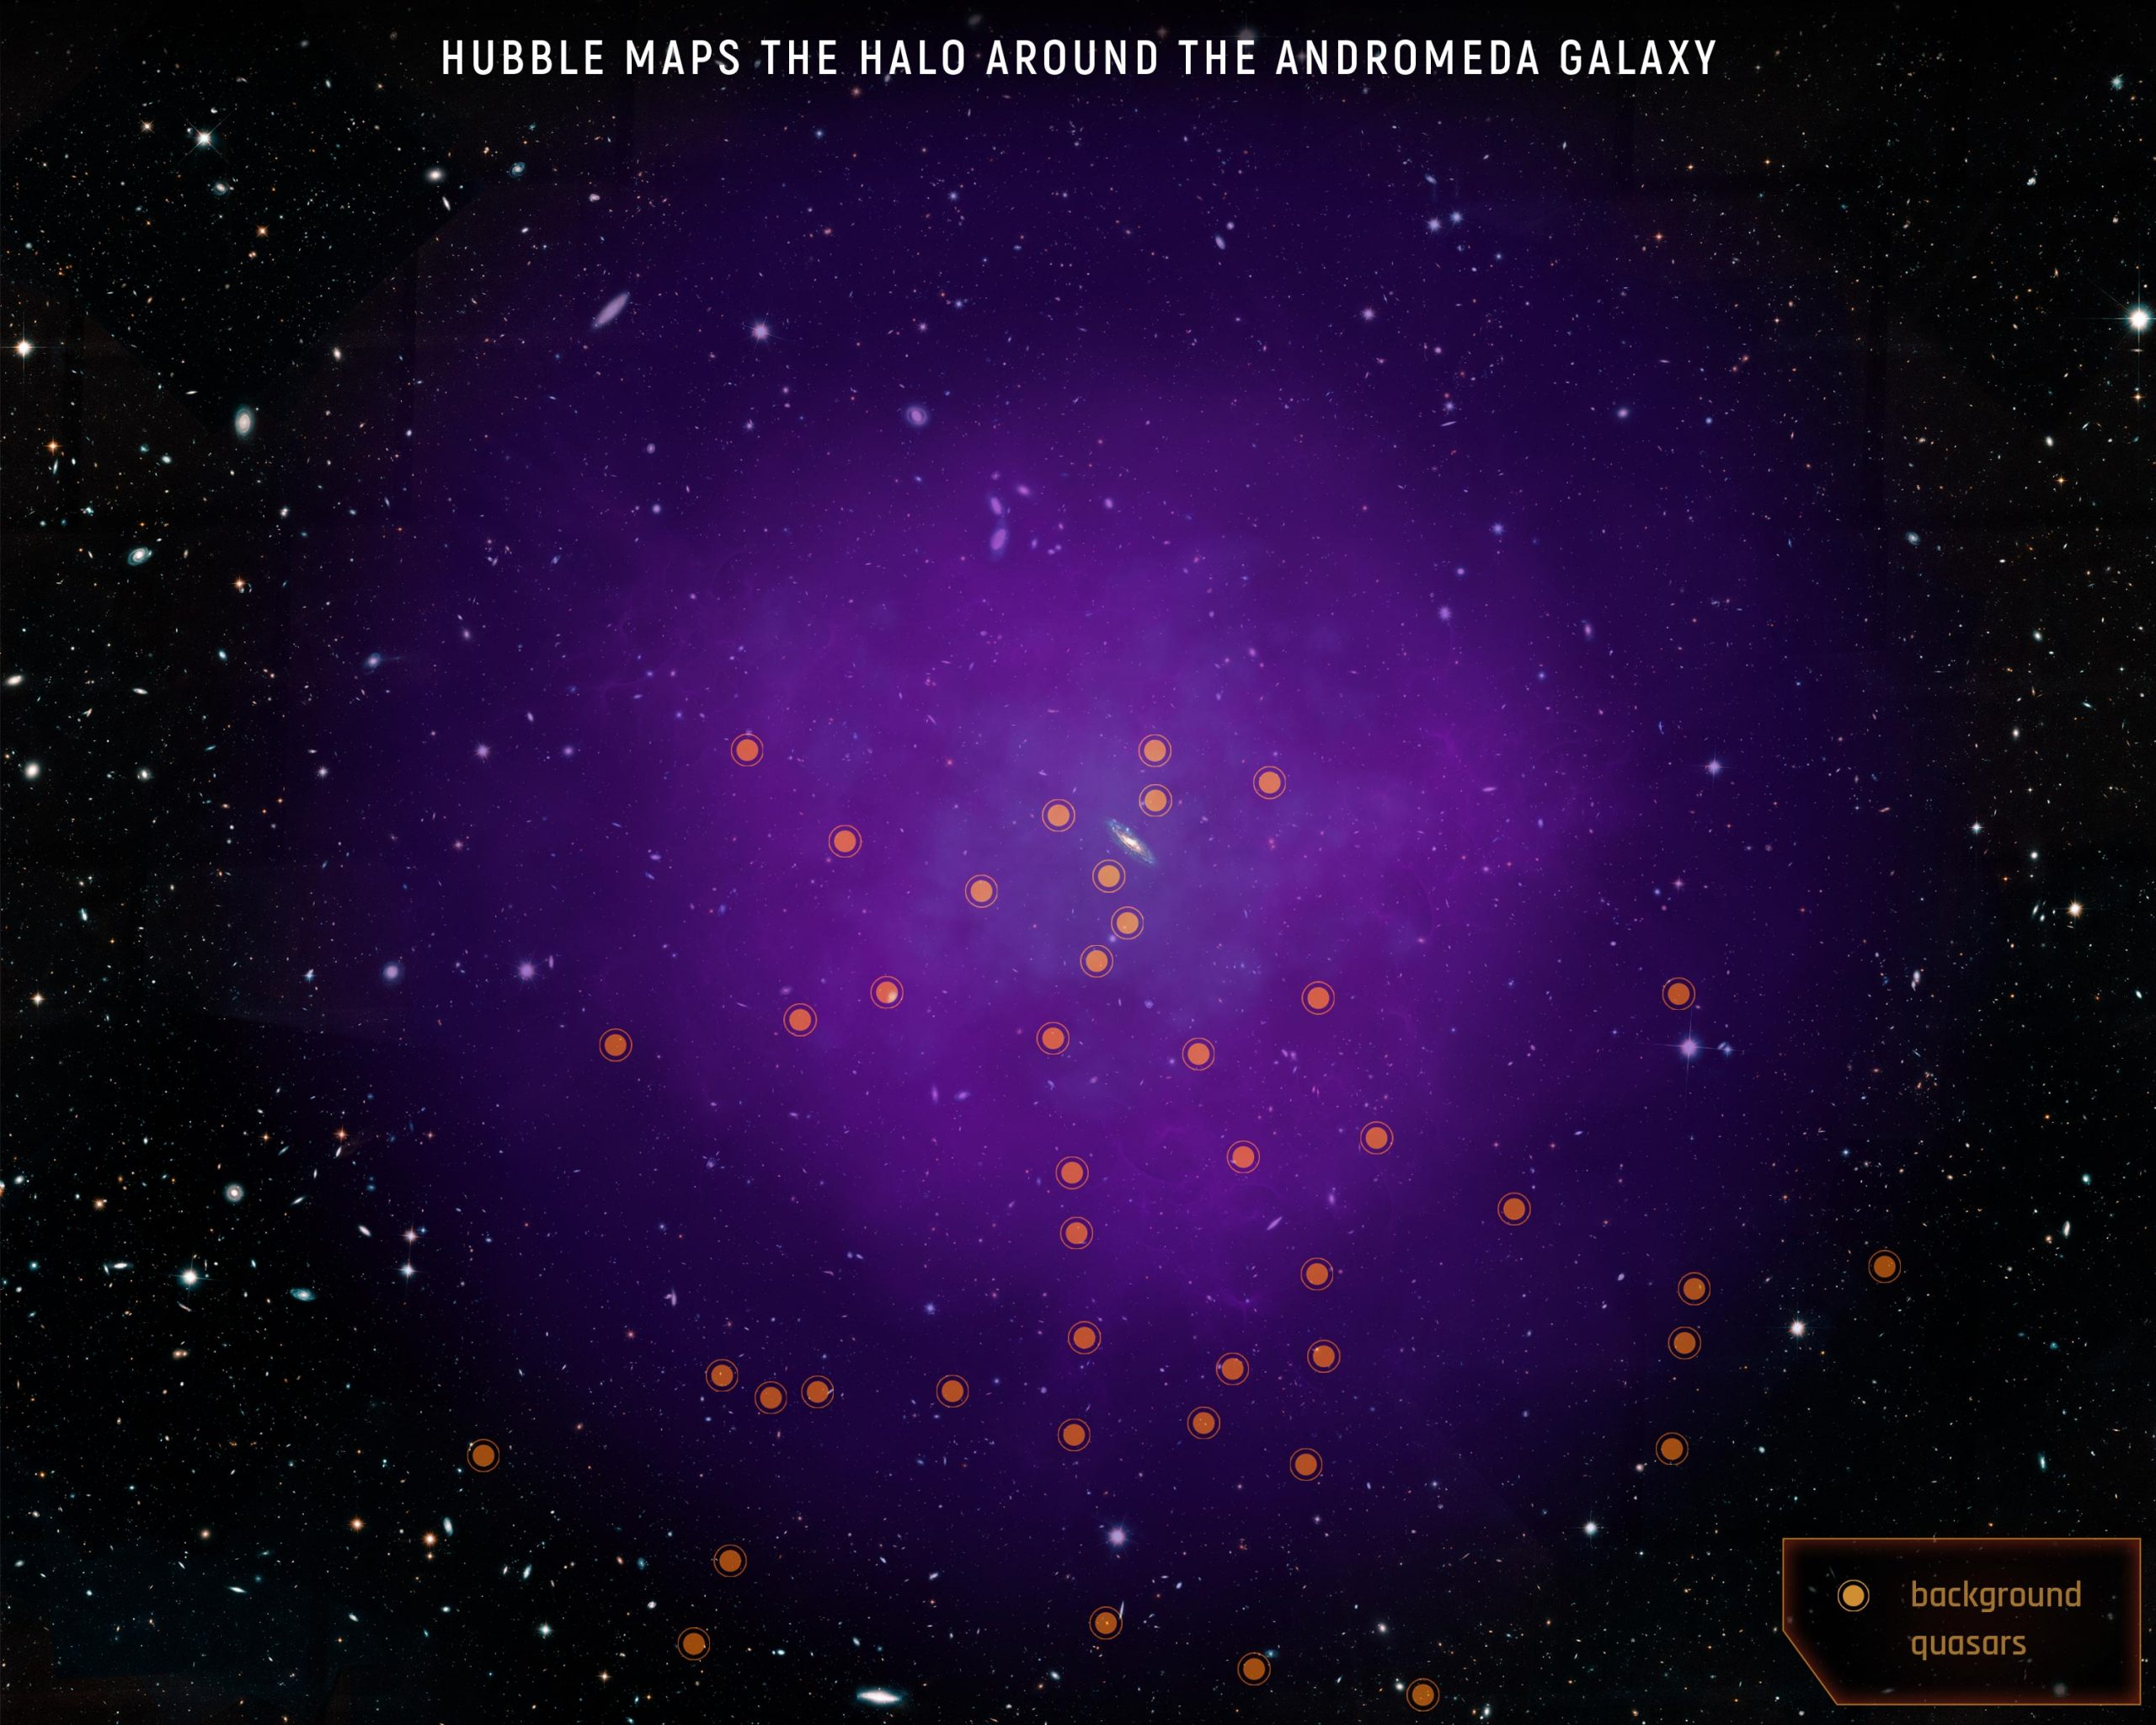 Andromeda Halo Quasars scaled